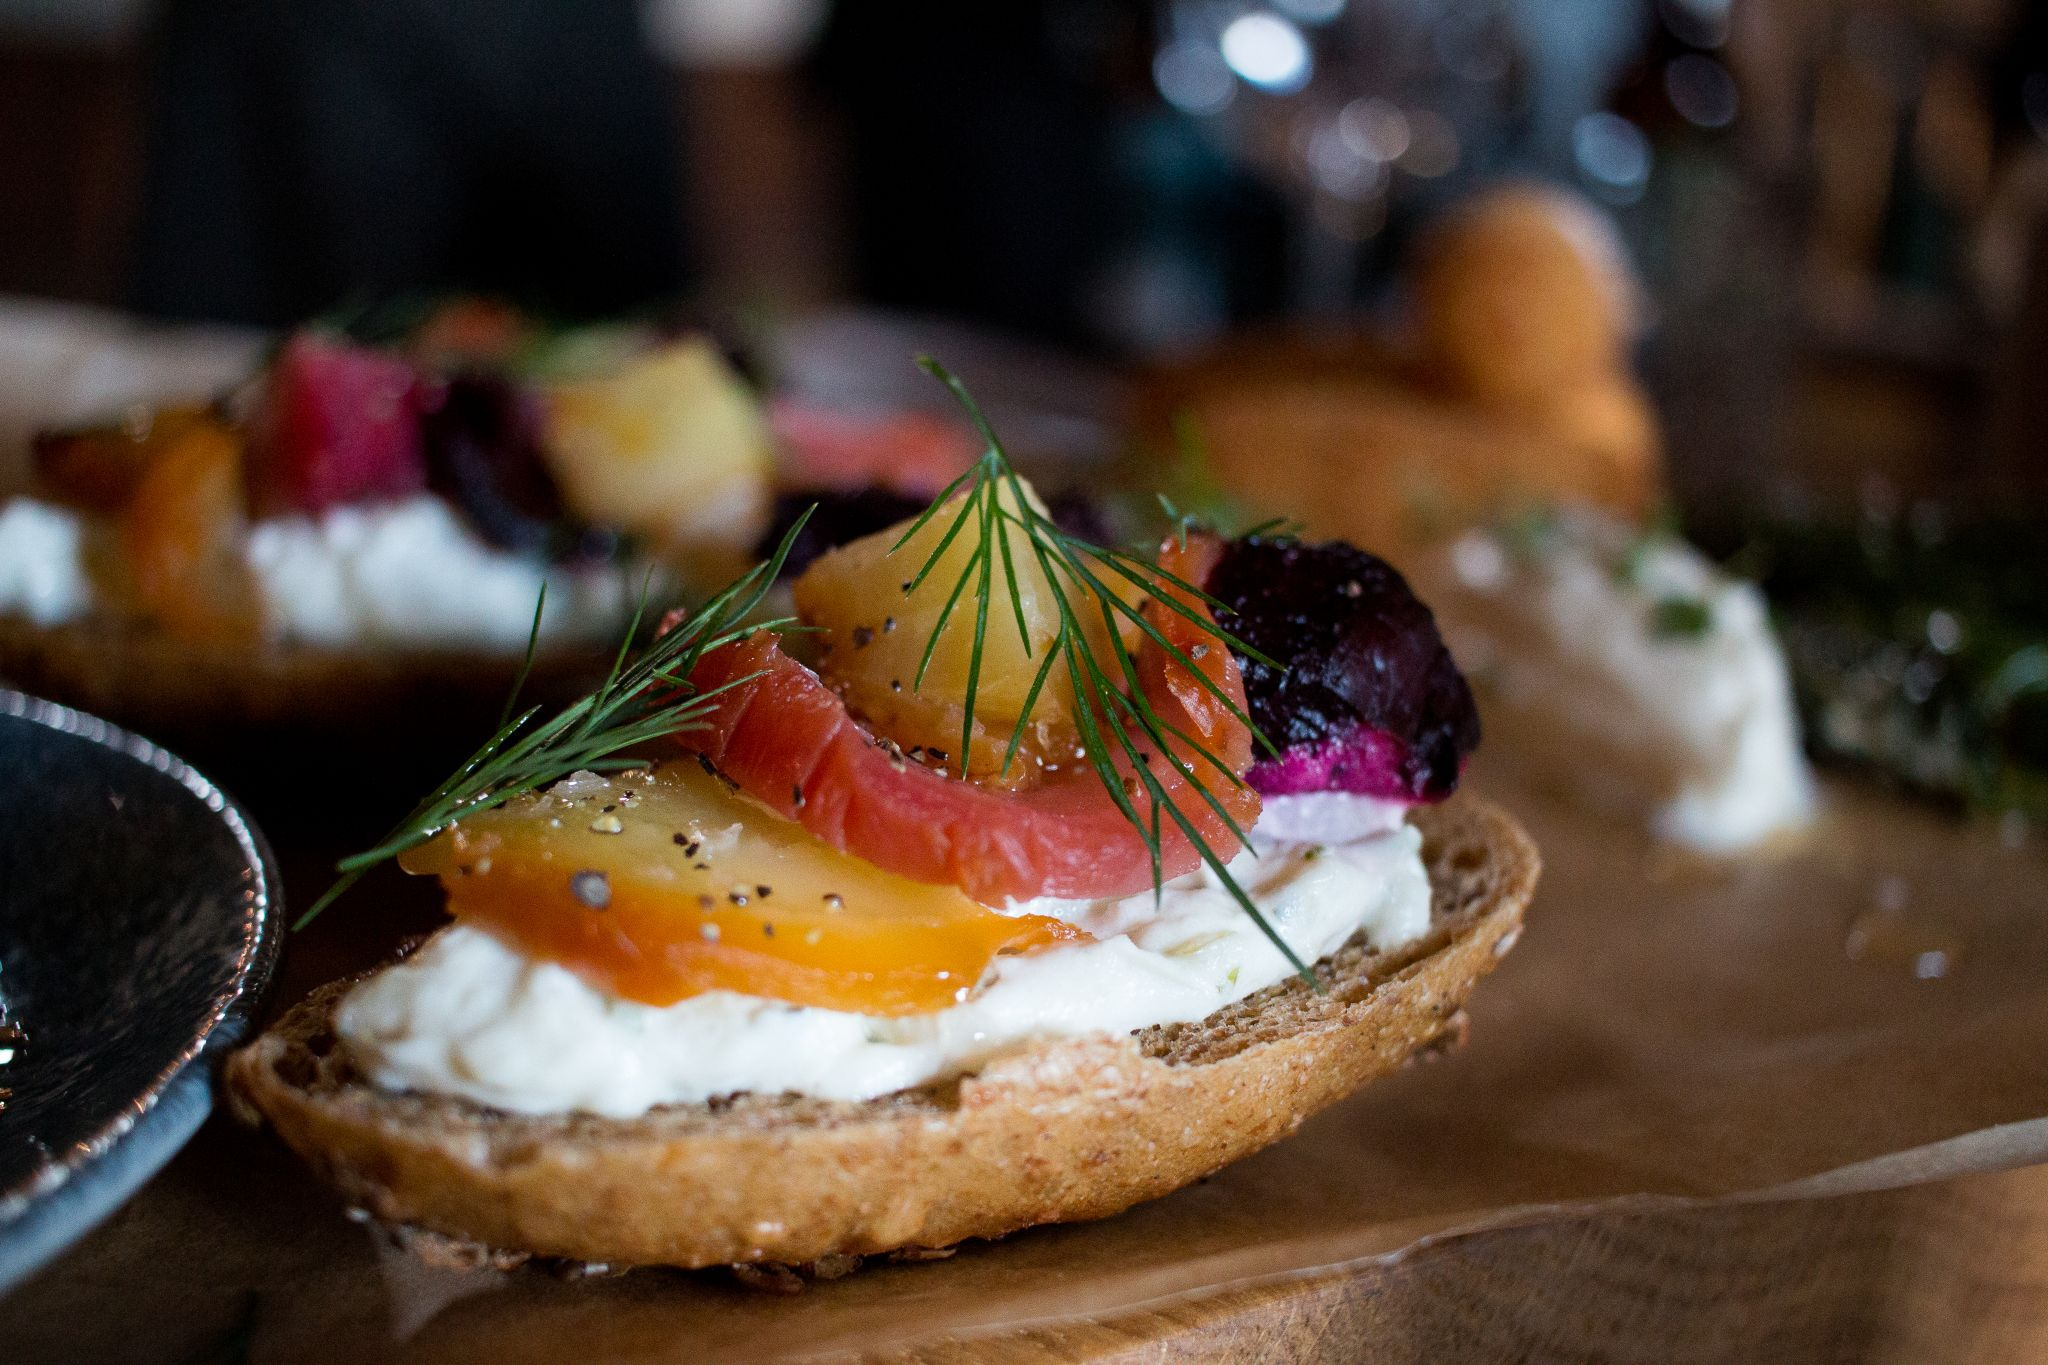 bonded warehouse food photography sunderland bruschetta